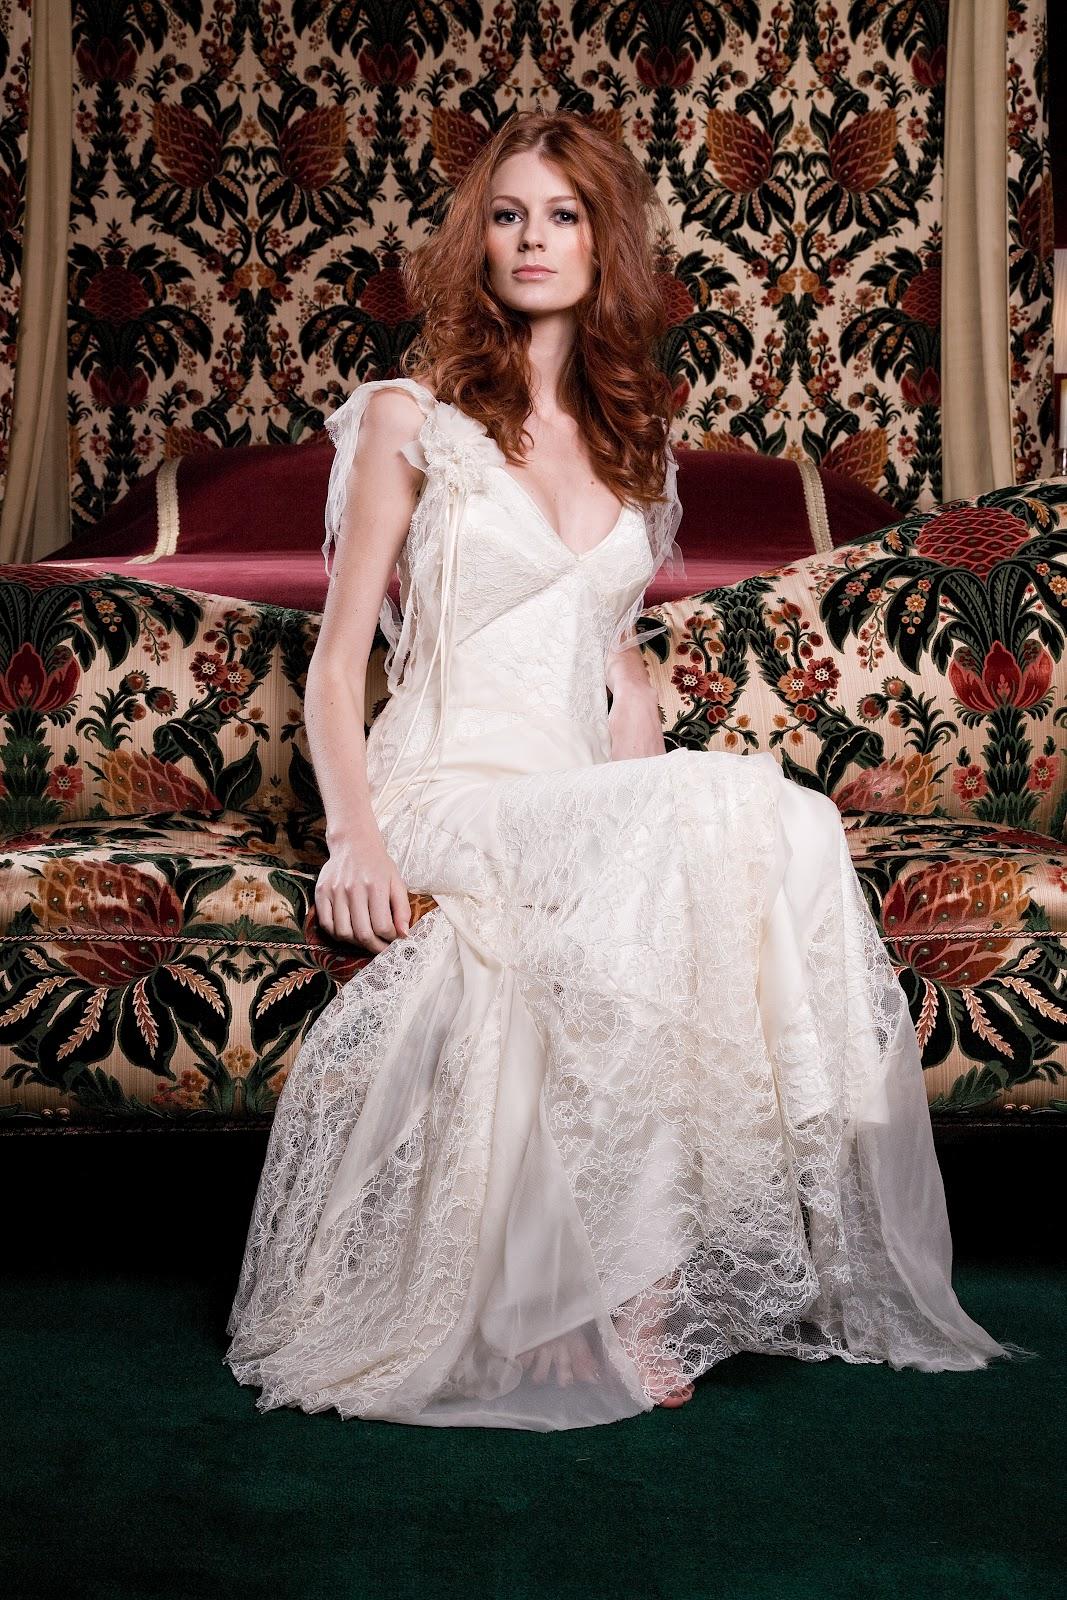 Interview With Wedding Dress Designer - Martin Charles